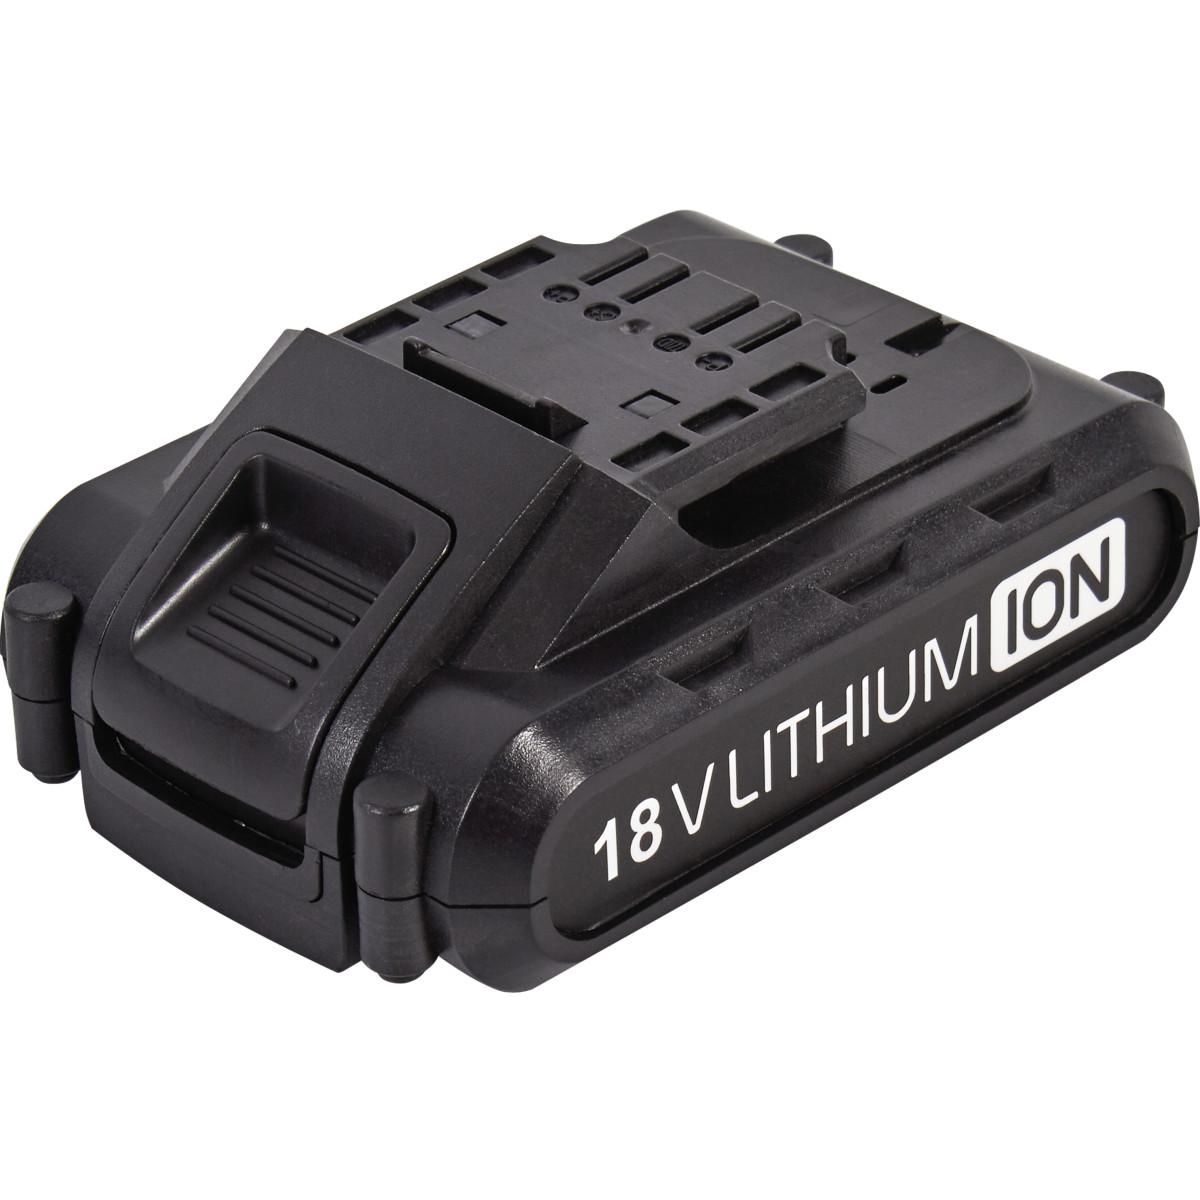 Аккумулятор Dexter E180-2 18 В Li-Ion 1.5 Ач